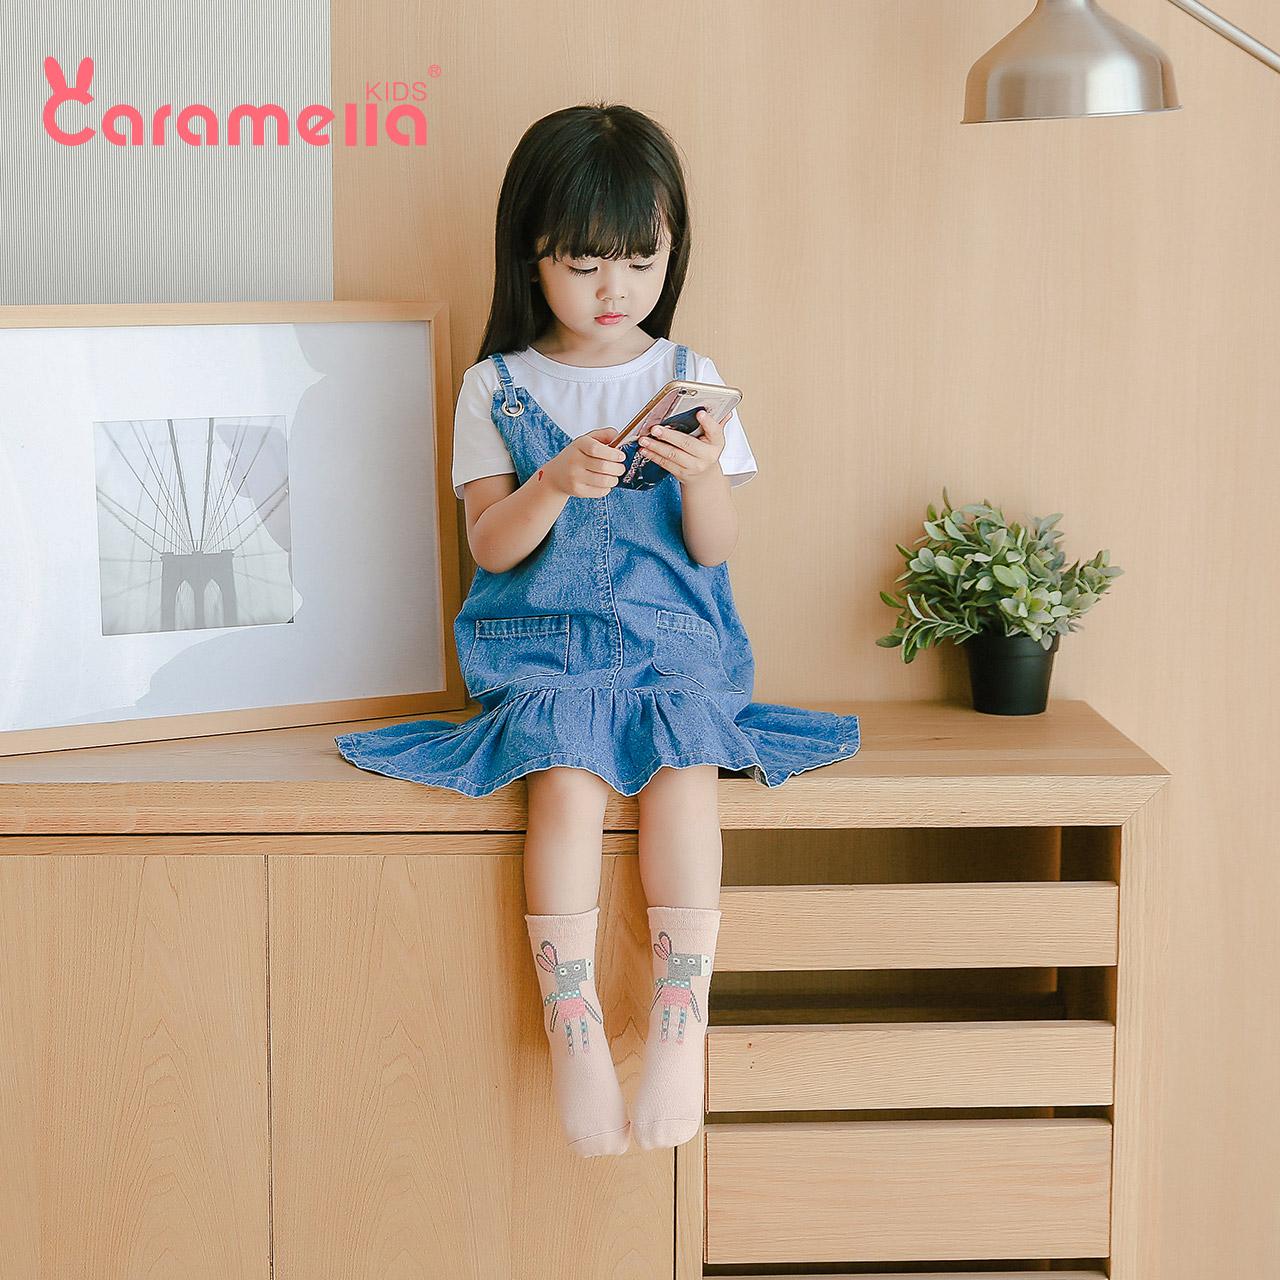 caramella秋冬婴儿袜子纯棉男女童袜儿童中筒袜地板袜宝宝袜子